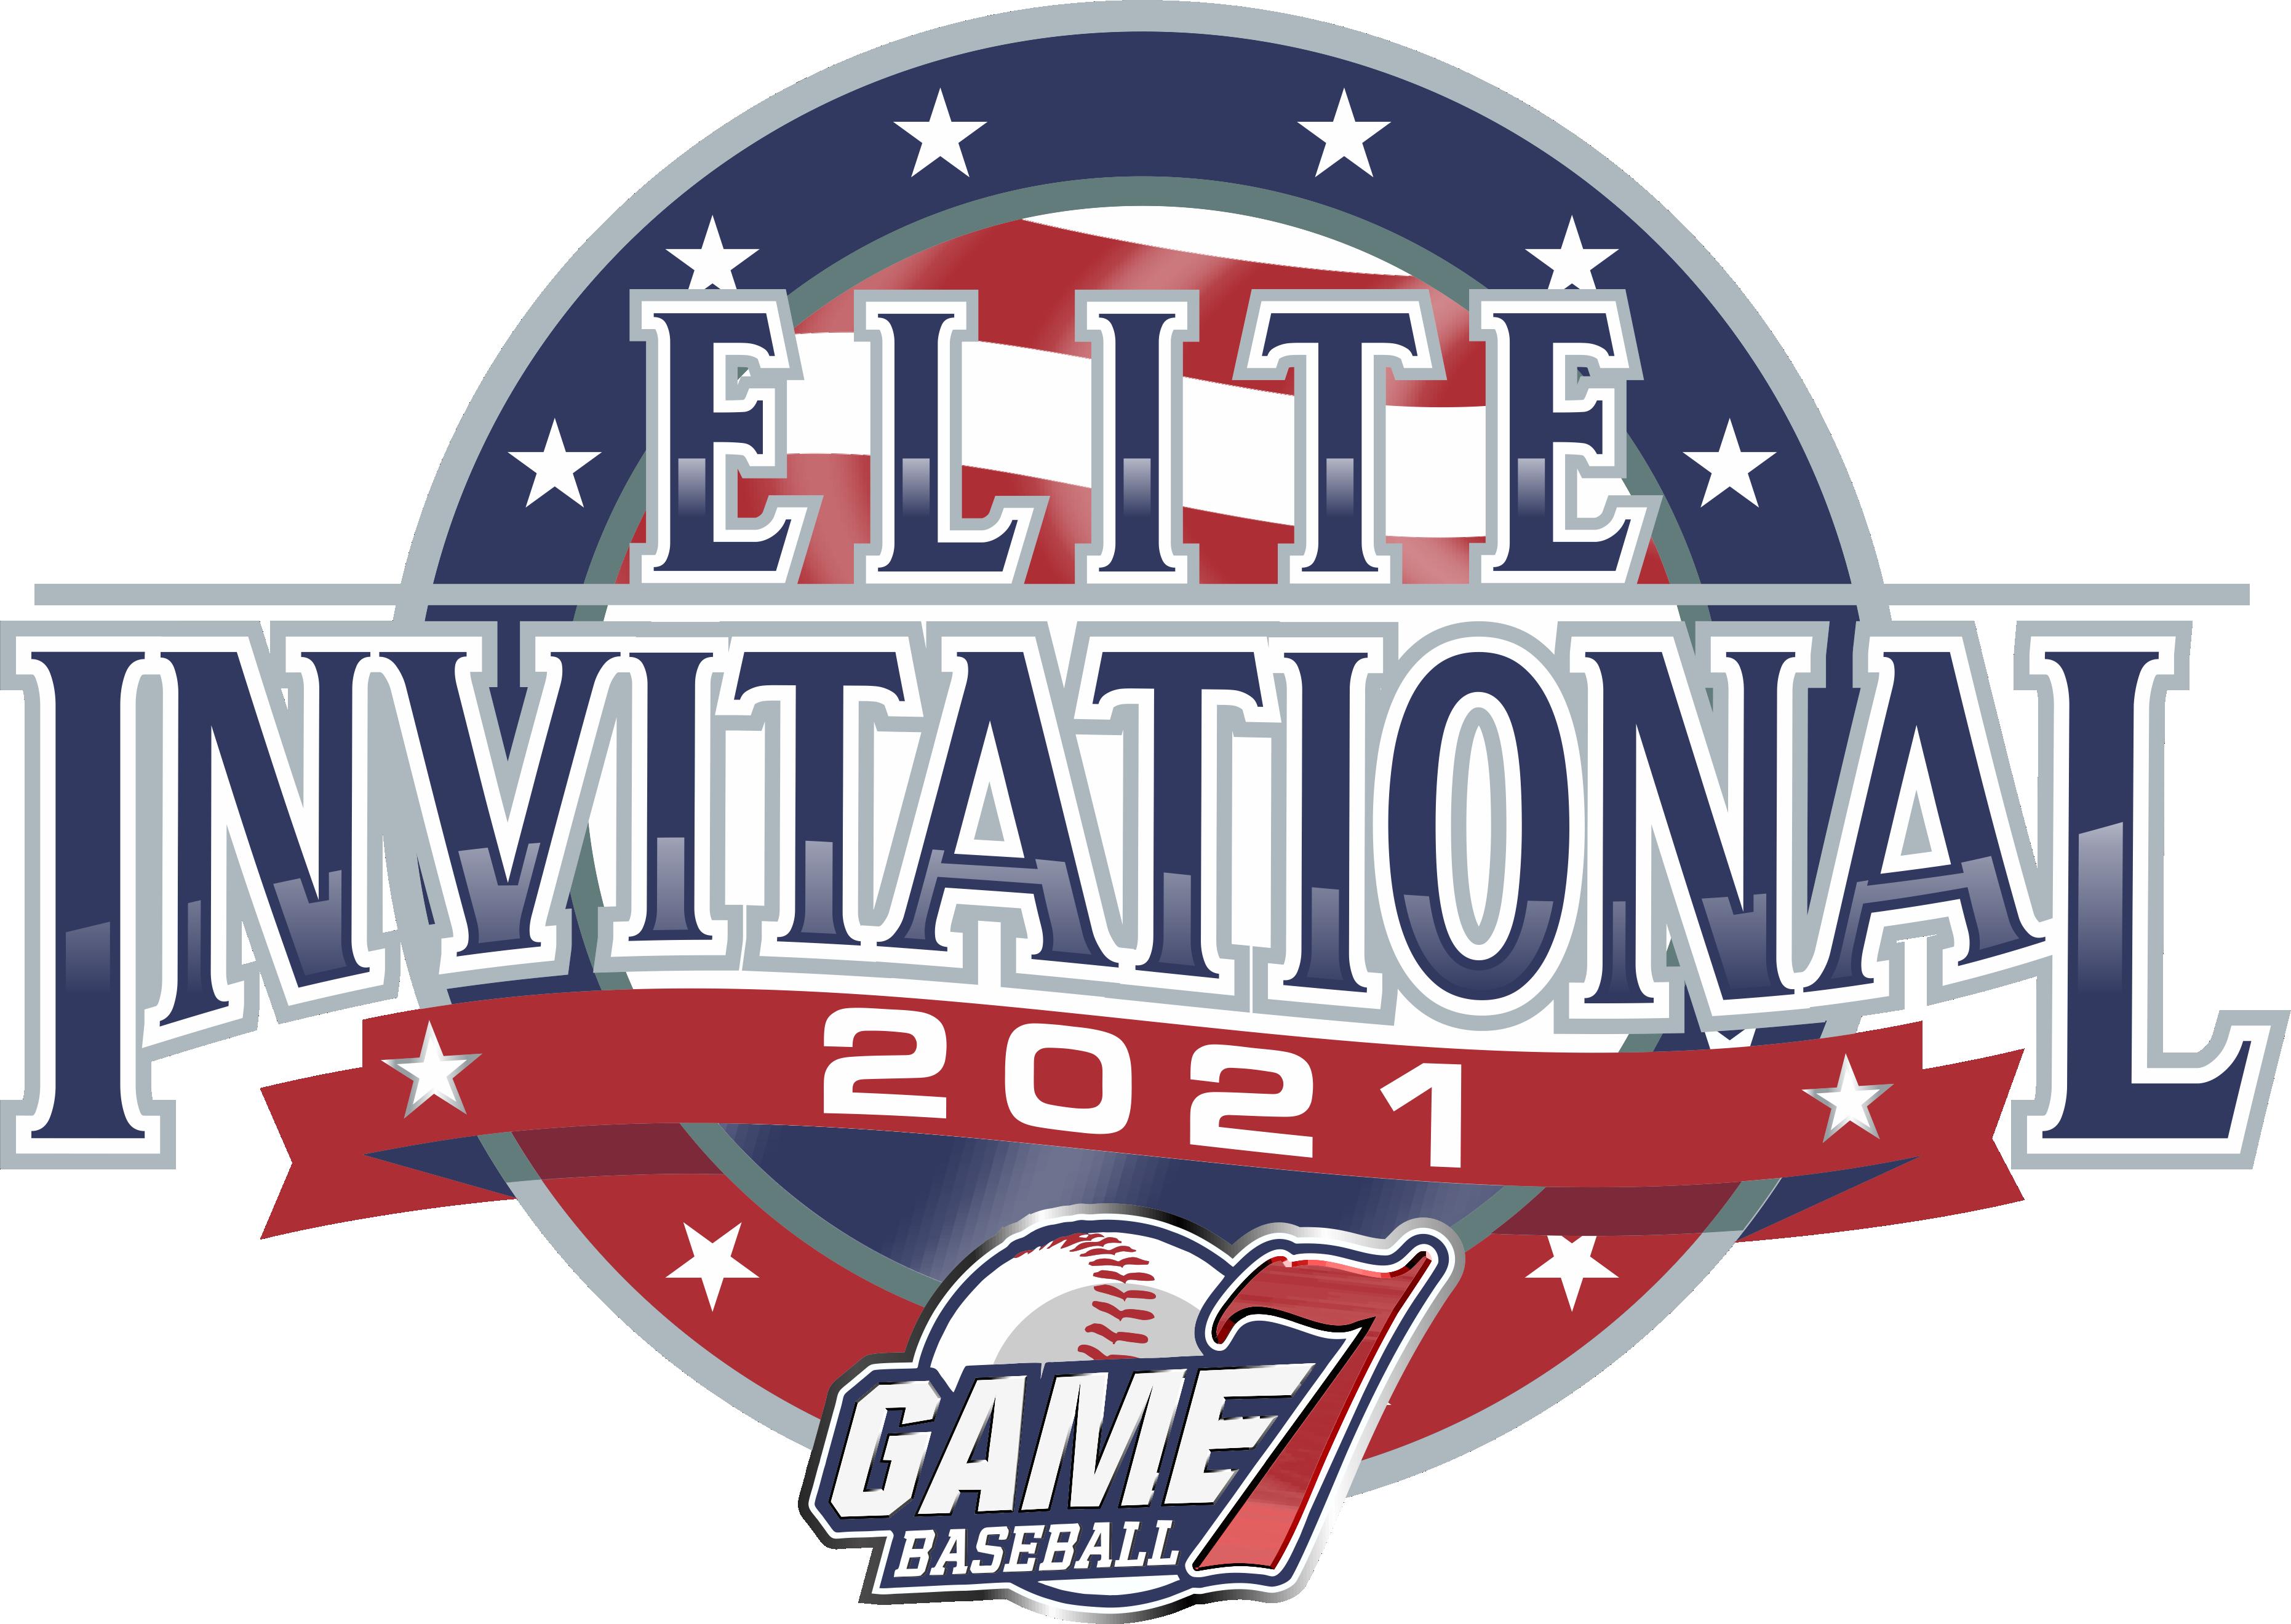 Elite Invitational 14U Championship* Logo